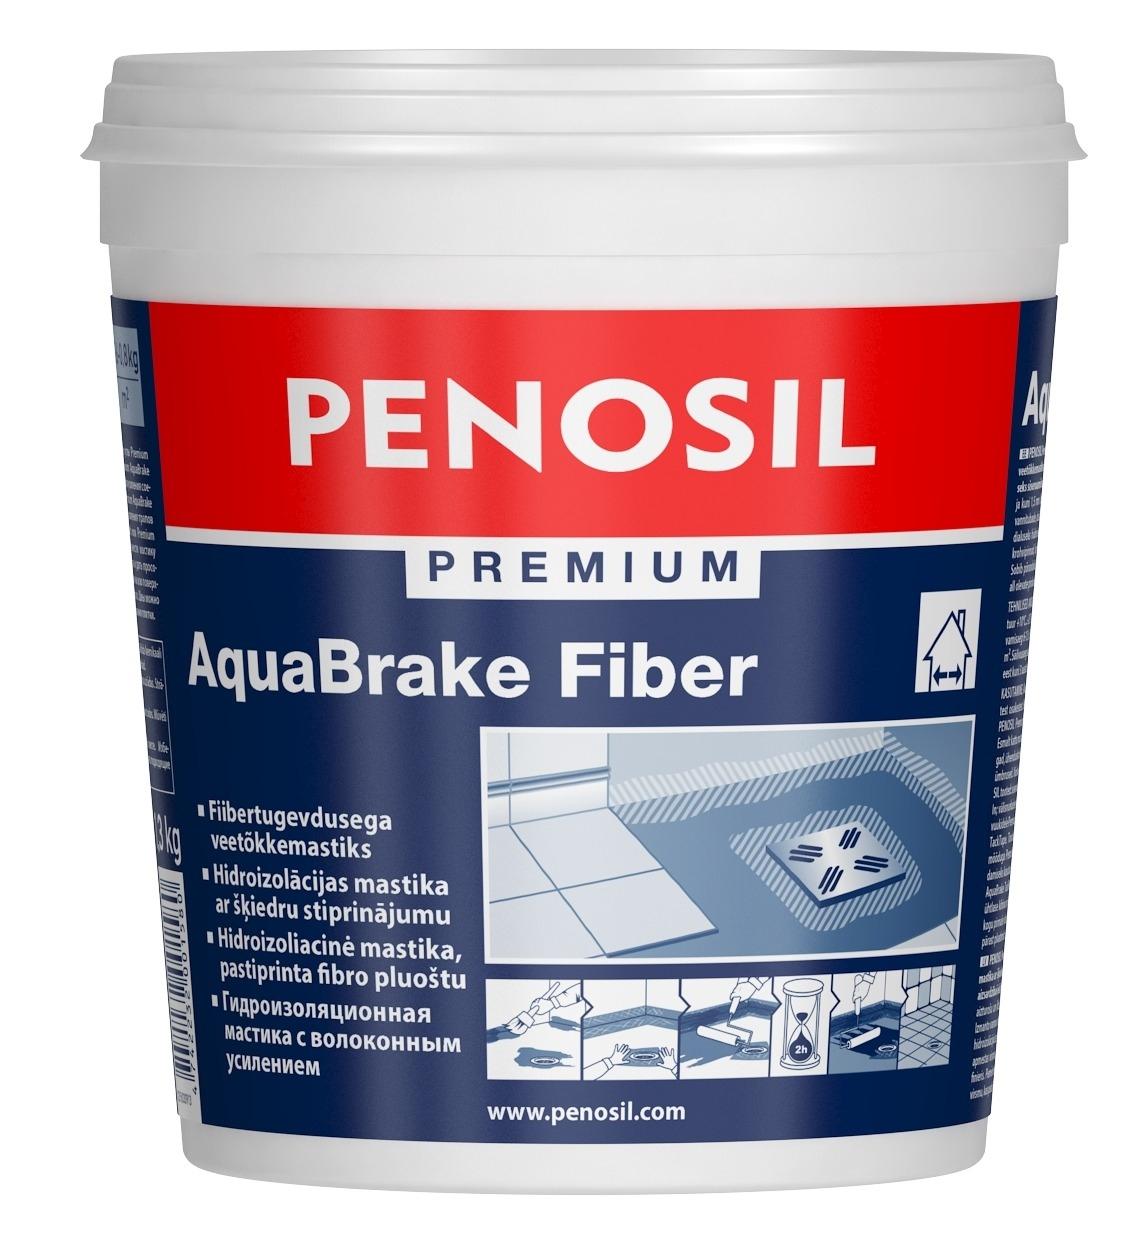 PENOSIL_Premium_AquaBrake_Fiber_13kg_BALTI